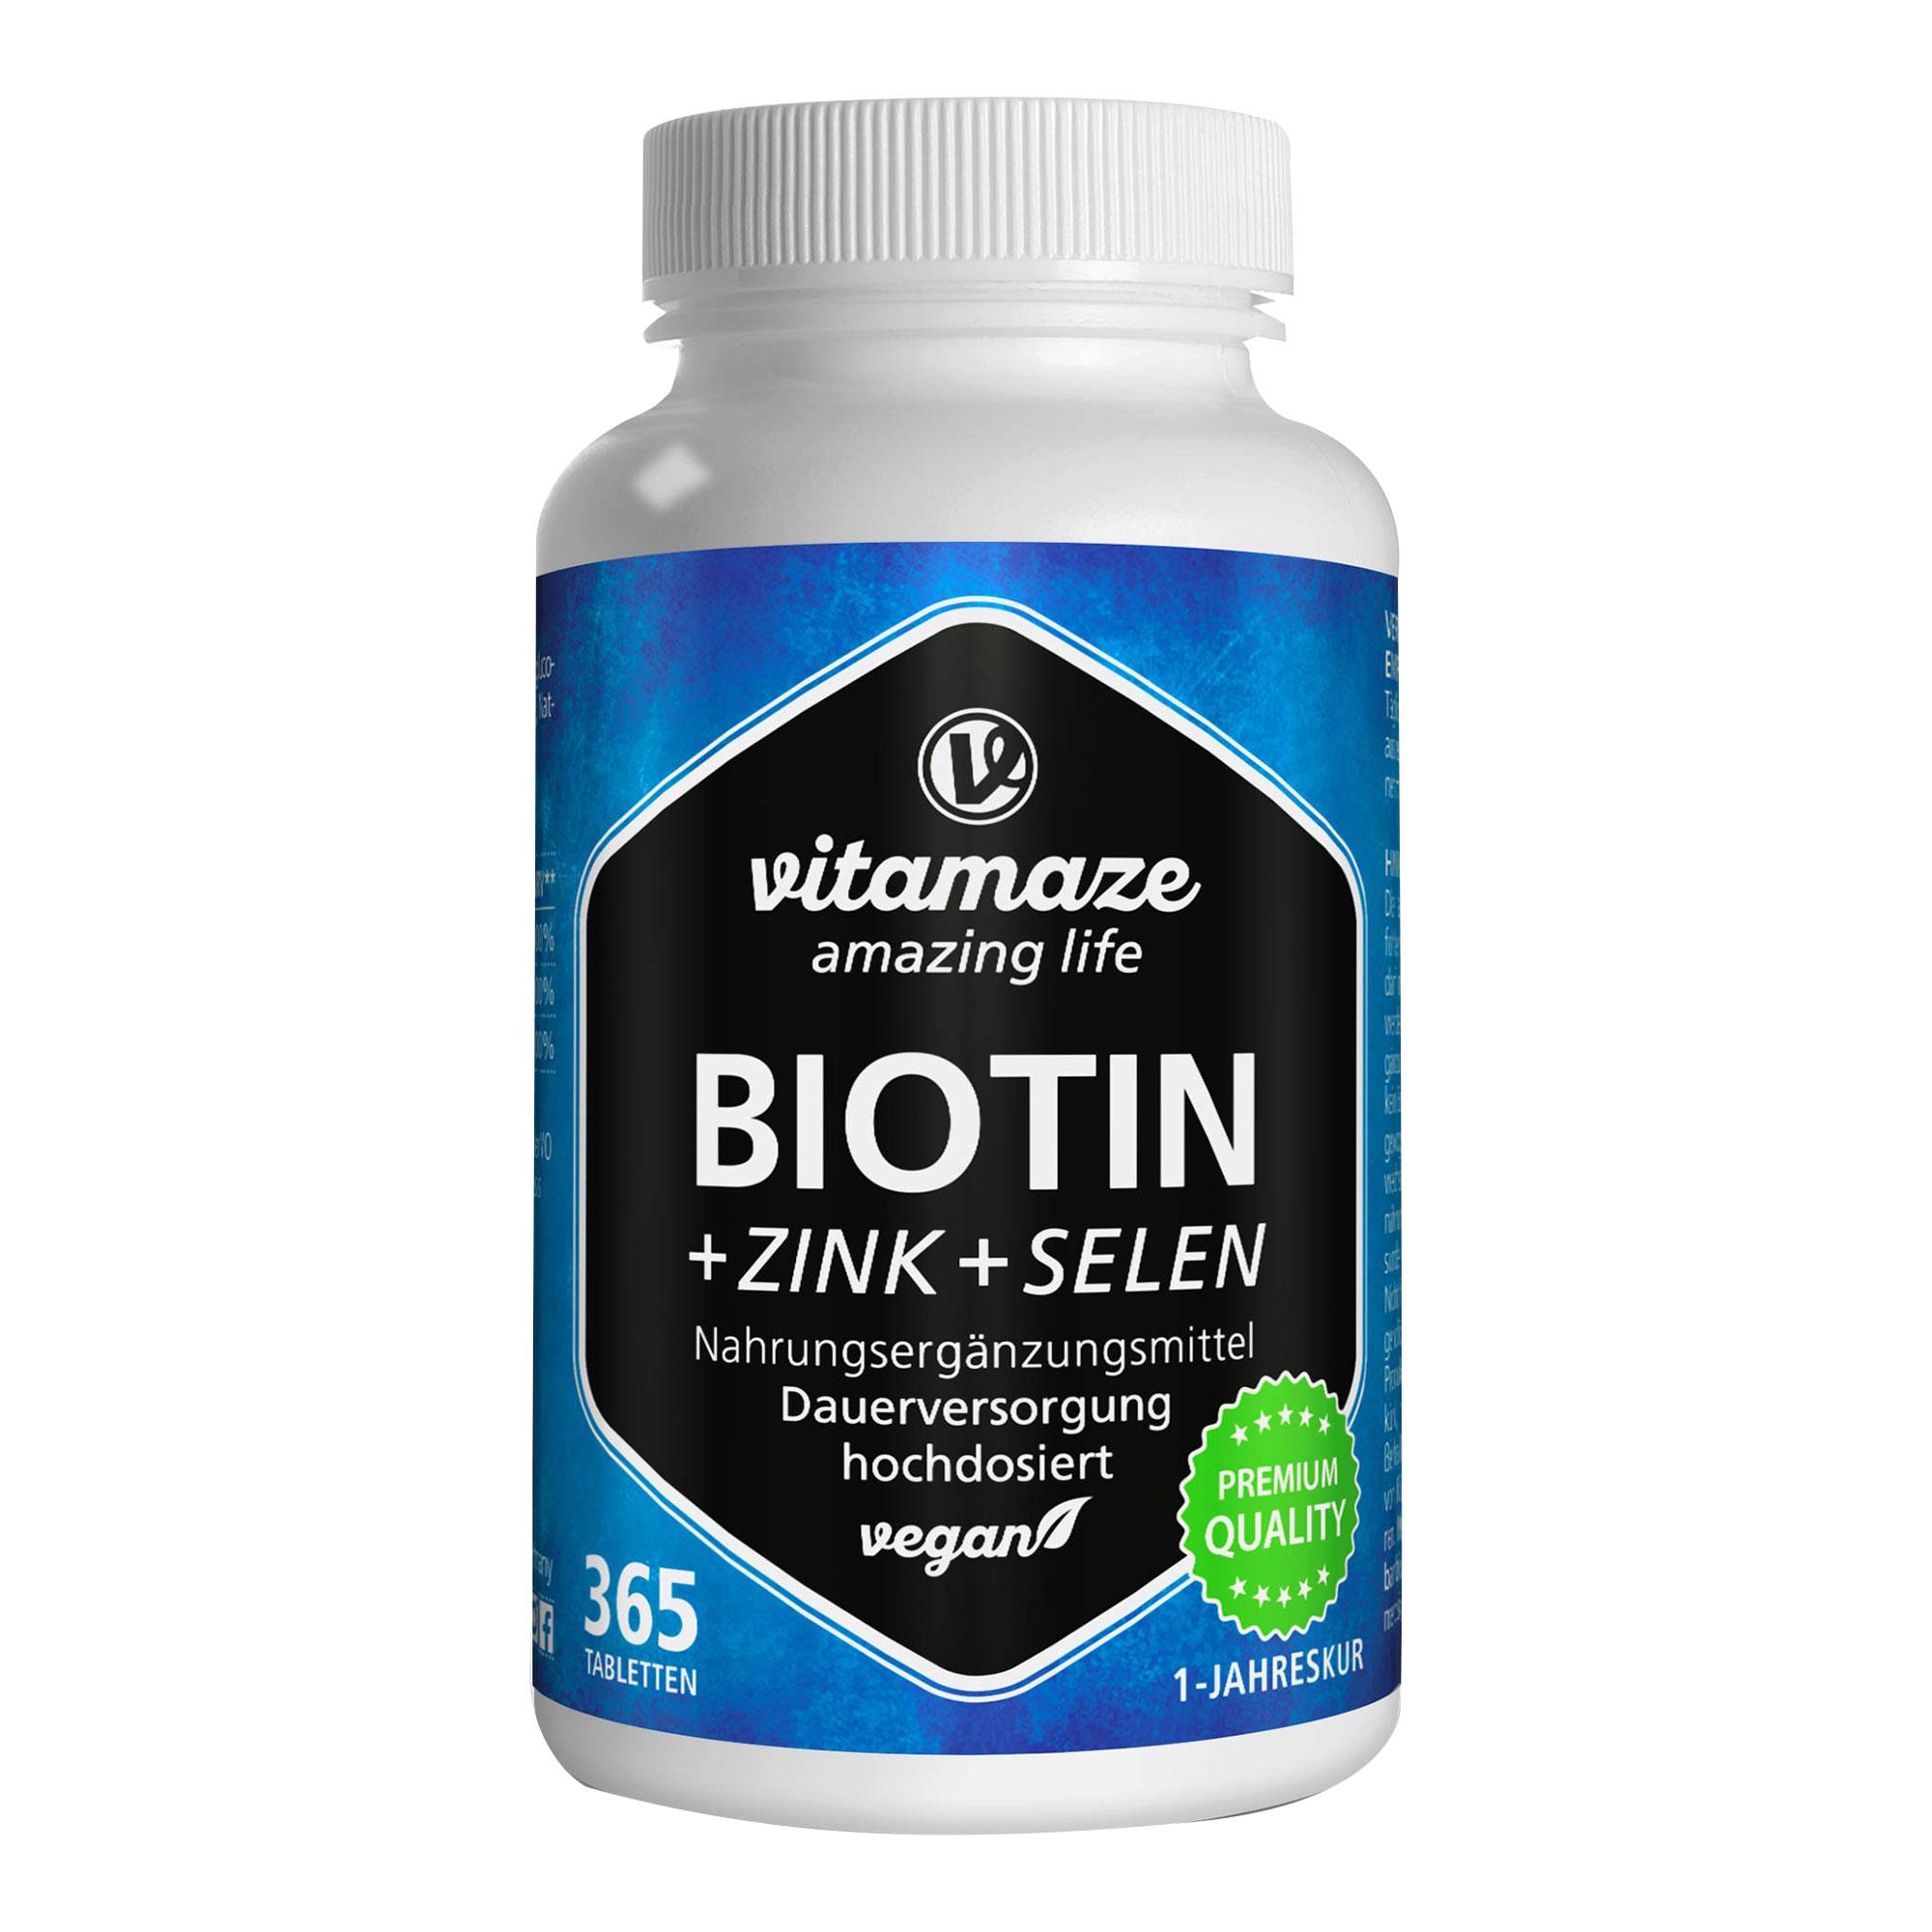 Biotin 10 mg hochdosiert+Zink+Selen Tabletten